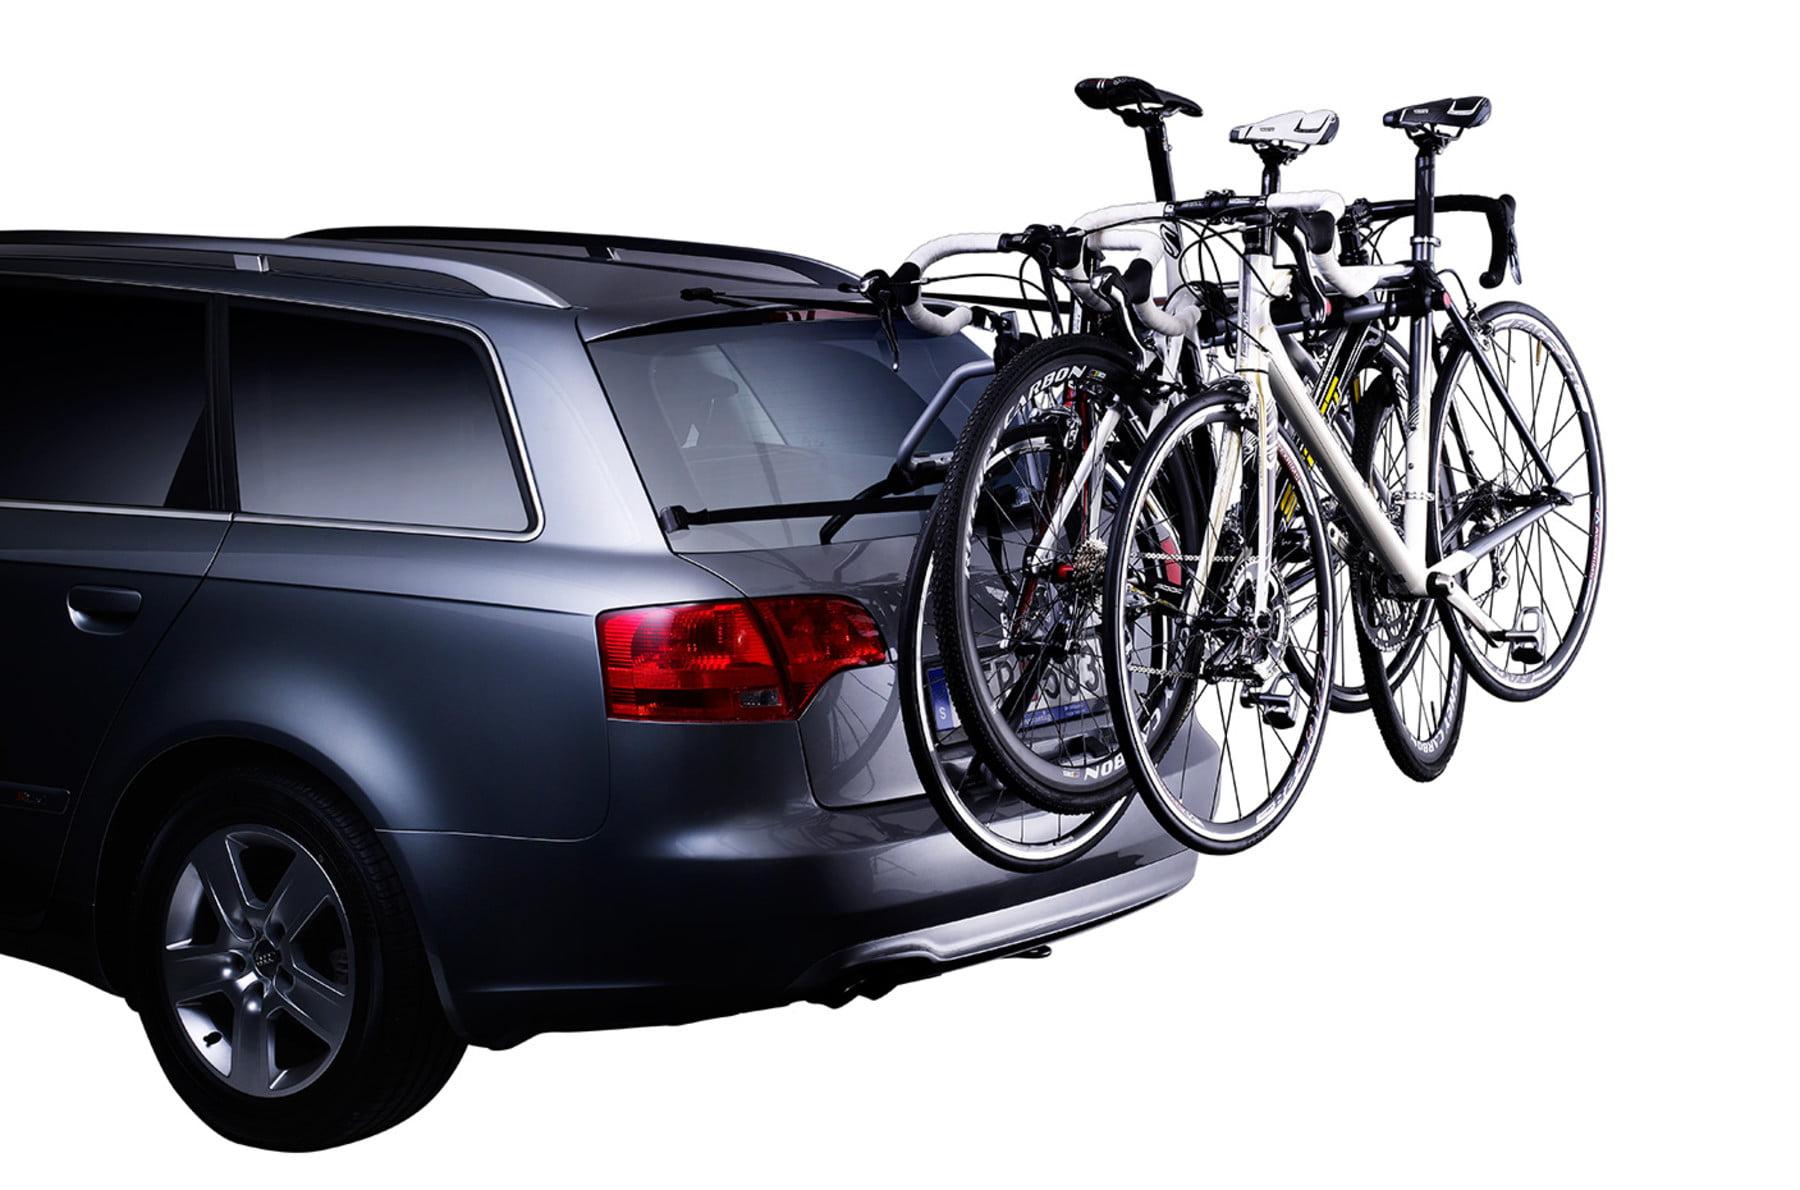 Suport biciclete cu prindere pe haion Thule FreeWay 968 2